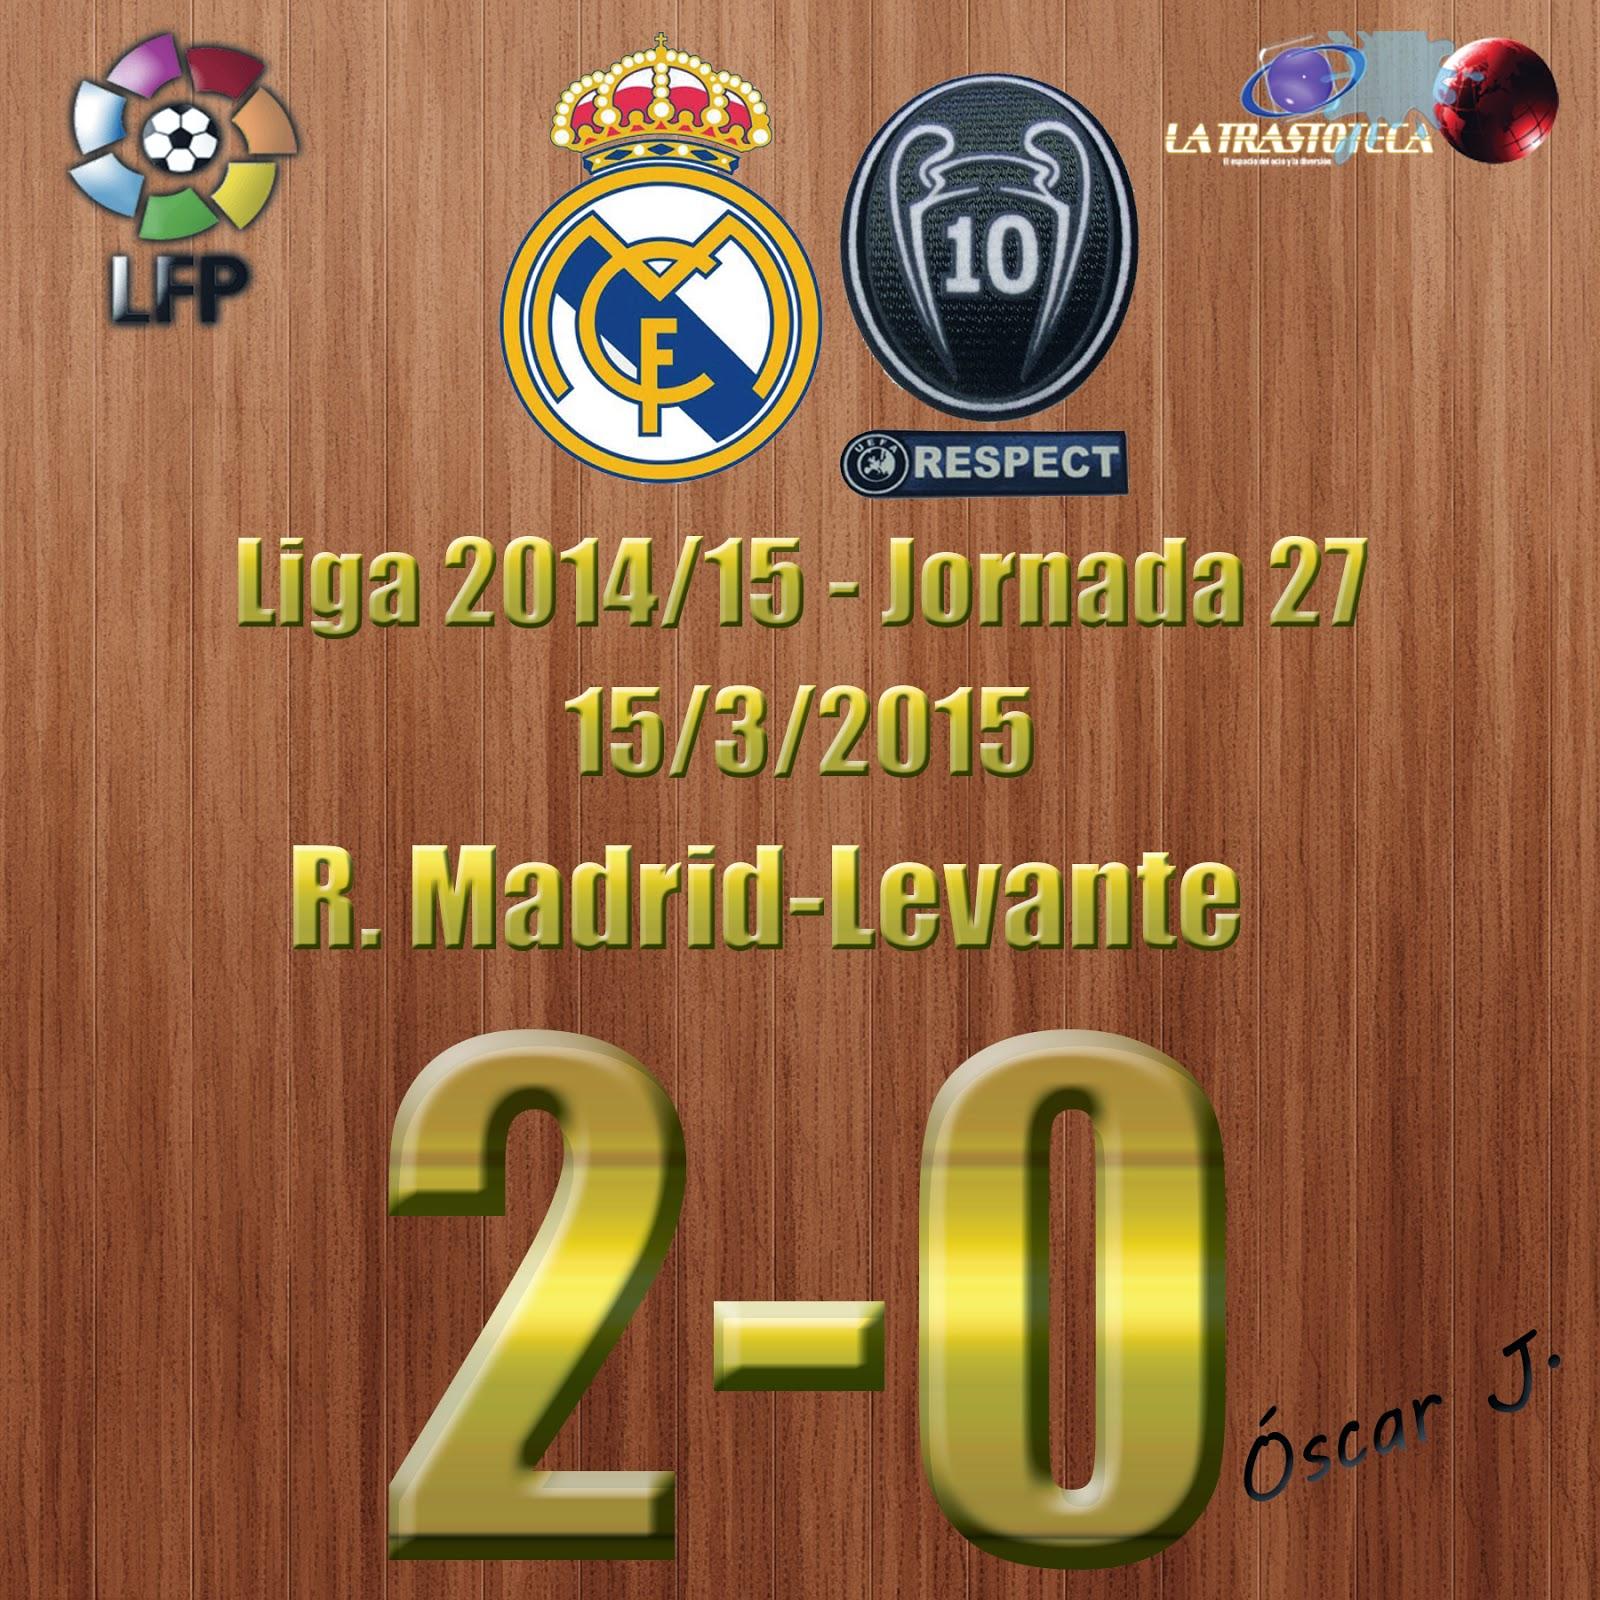 Real Madrid 2-0 Levante - Liga 2014/15 - Jornada 27 - (15/3/2015)